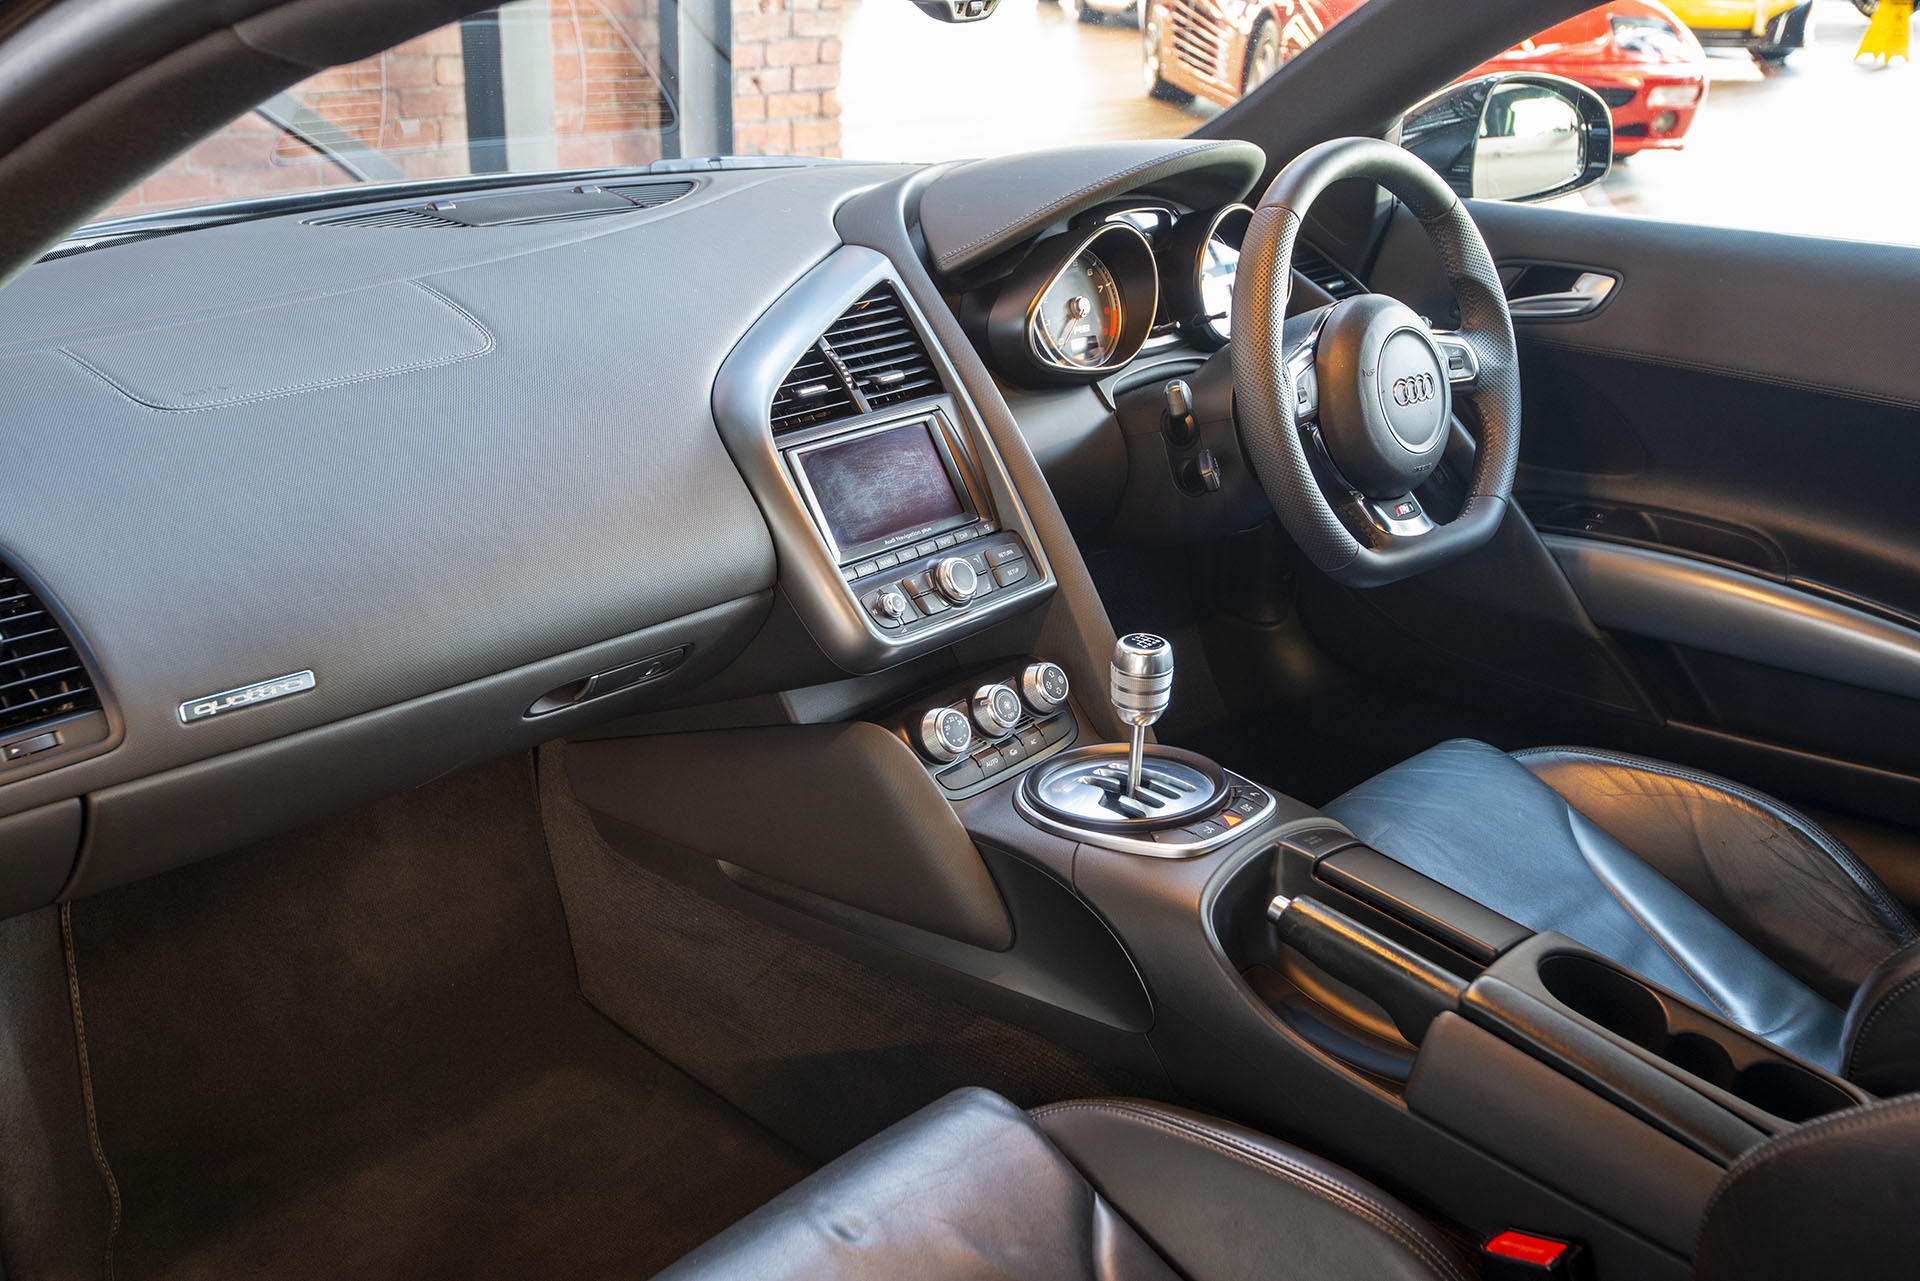 2007 Audi R8 Manual Coupe Richmonds Manual Guide